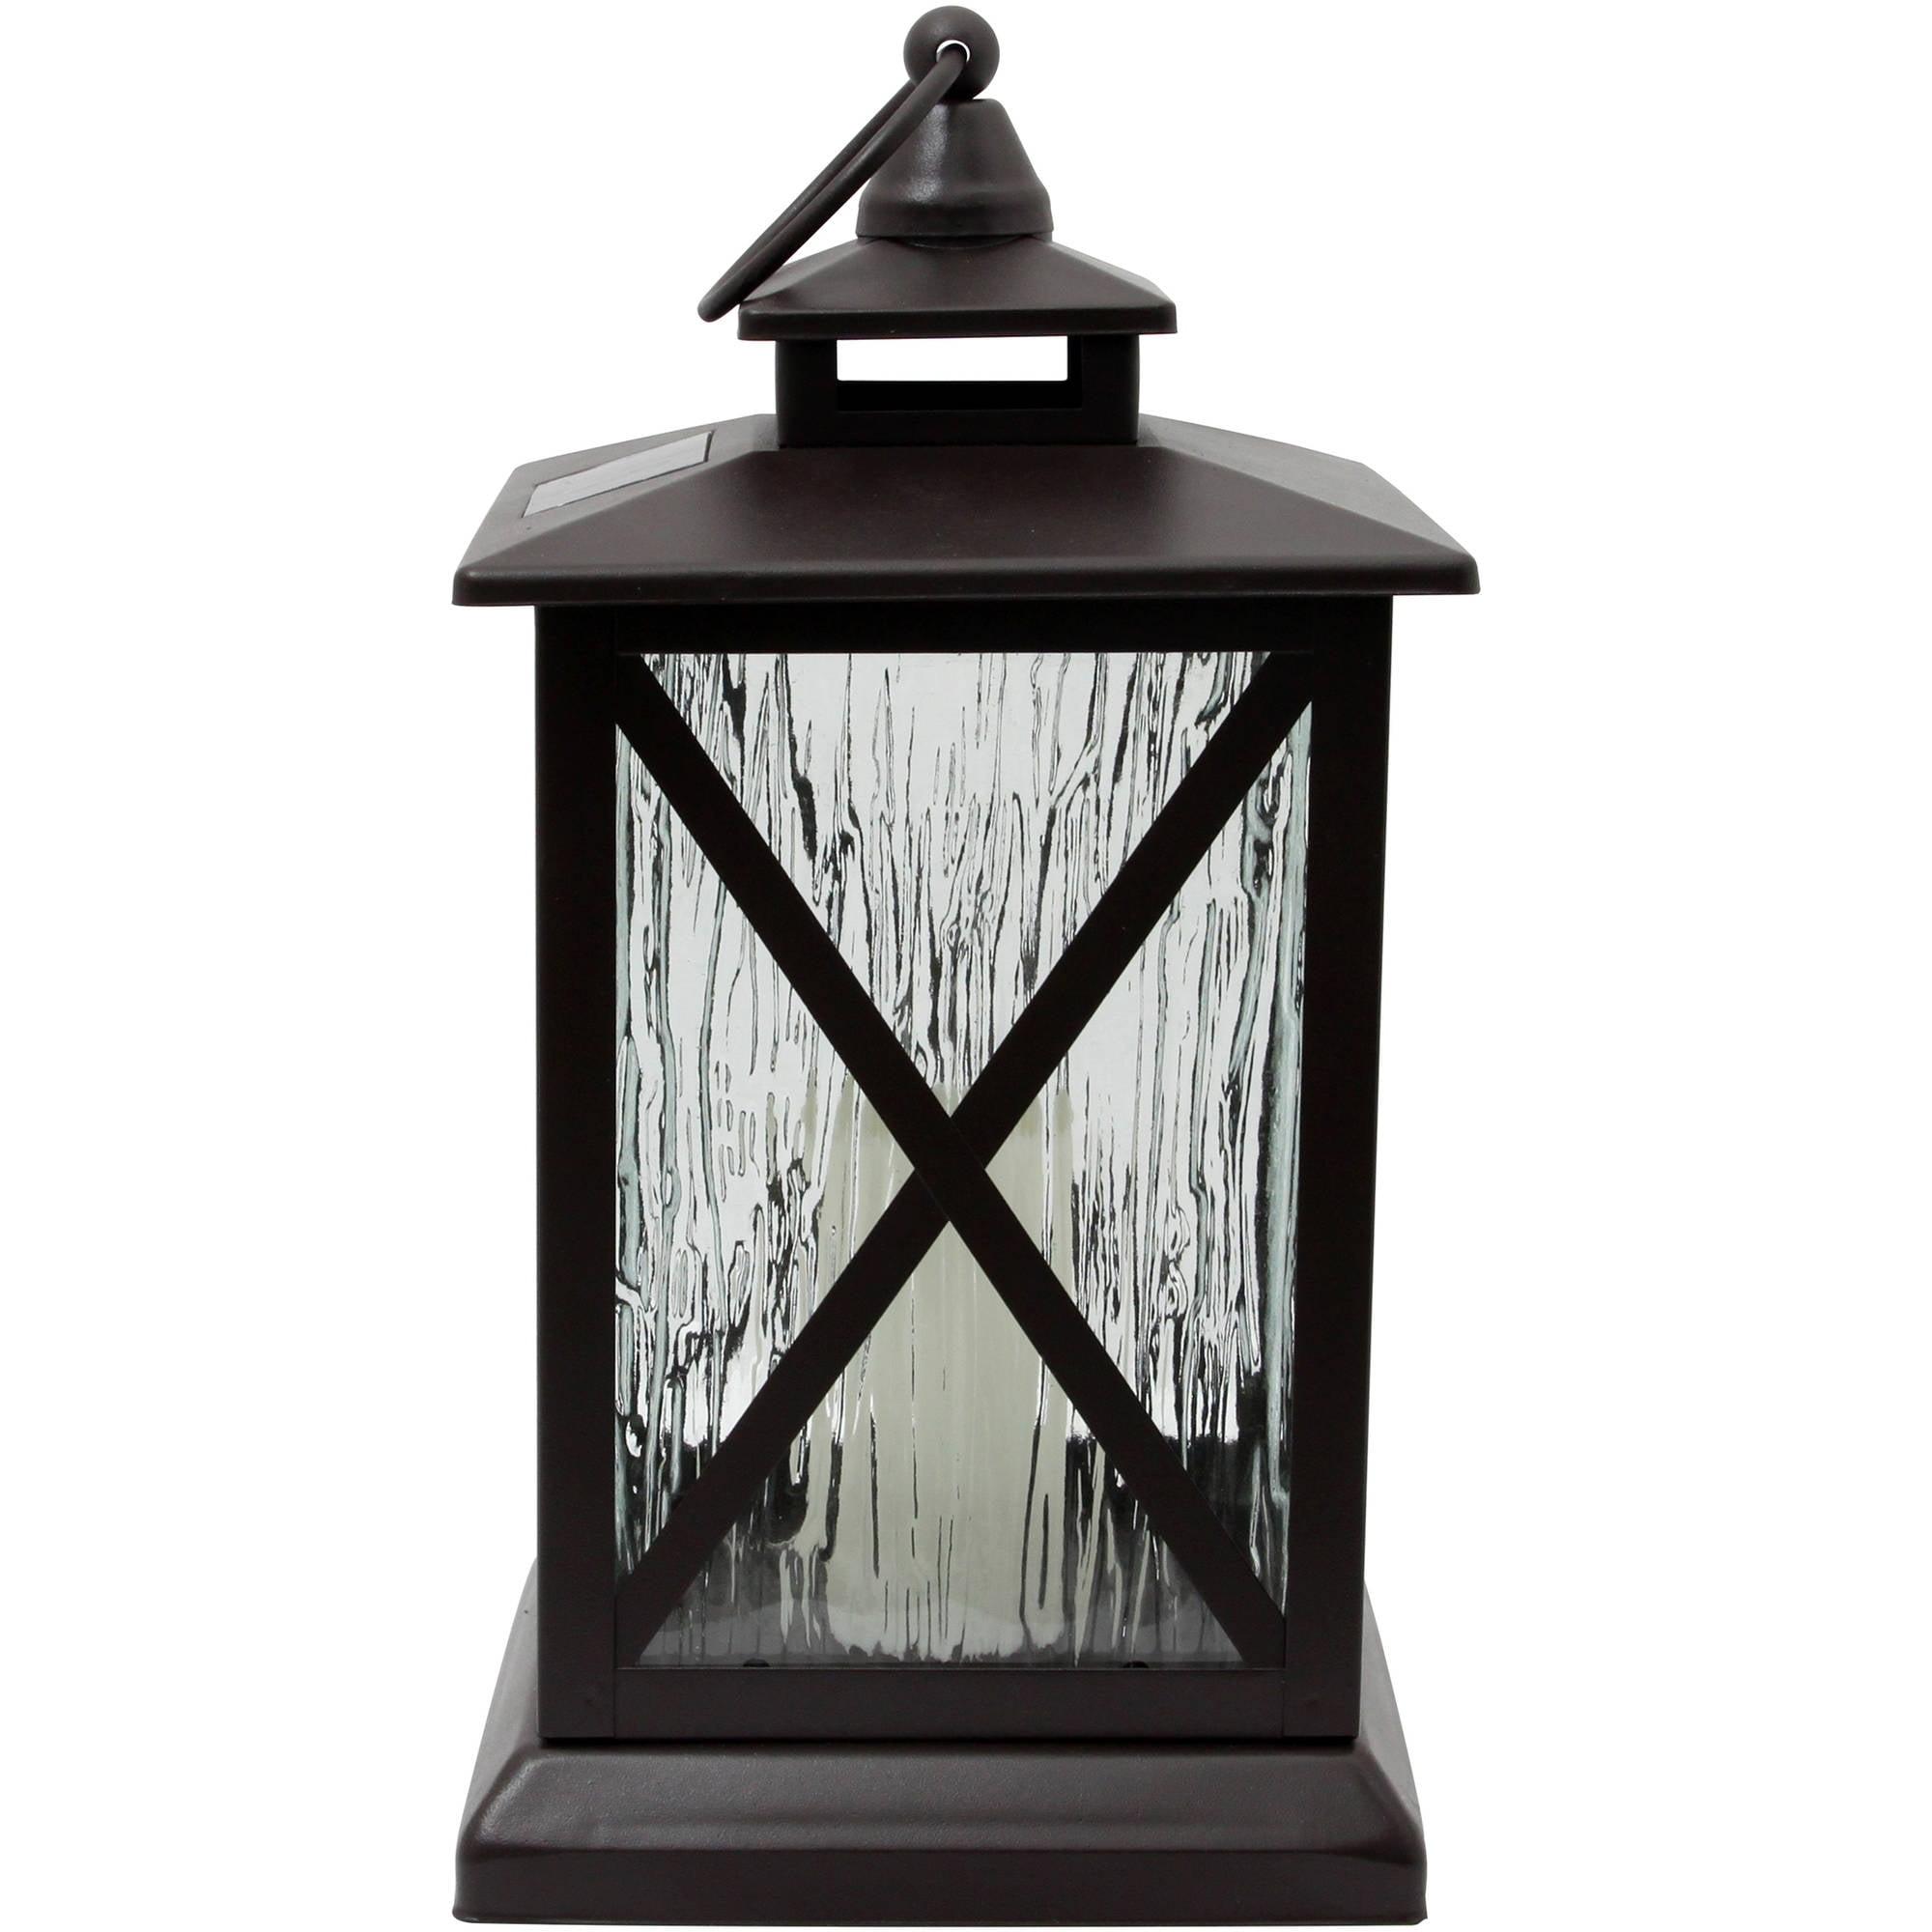 Mainstays Small Solar Powered Lantern